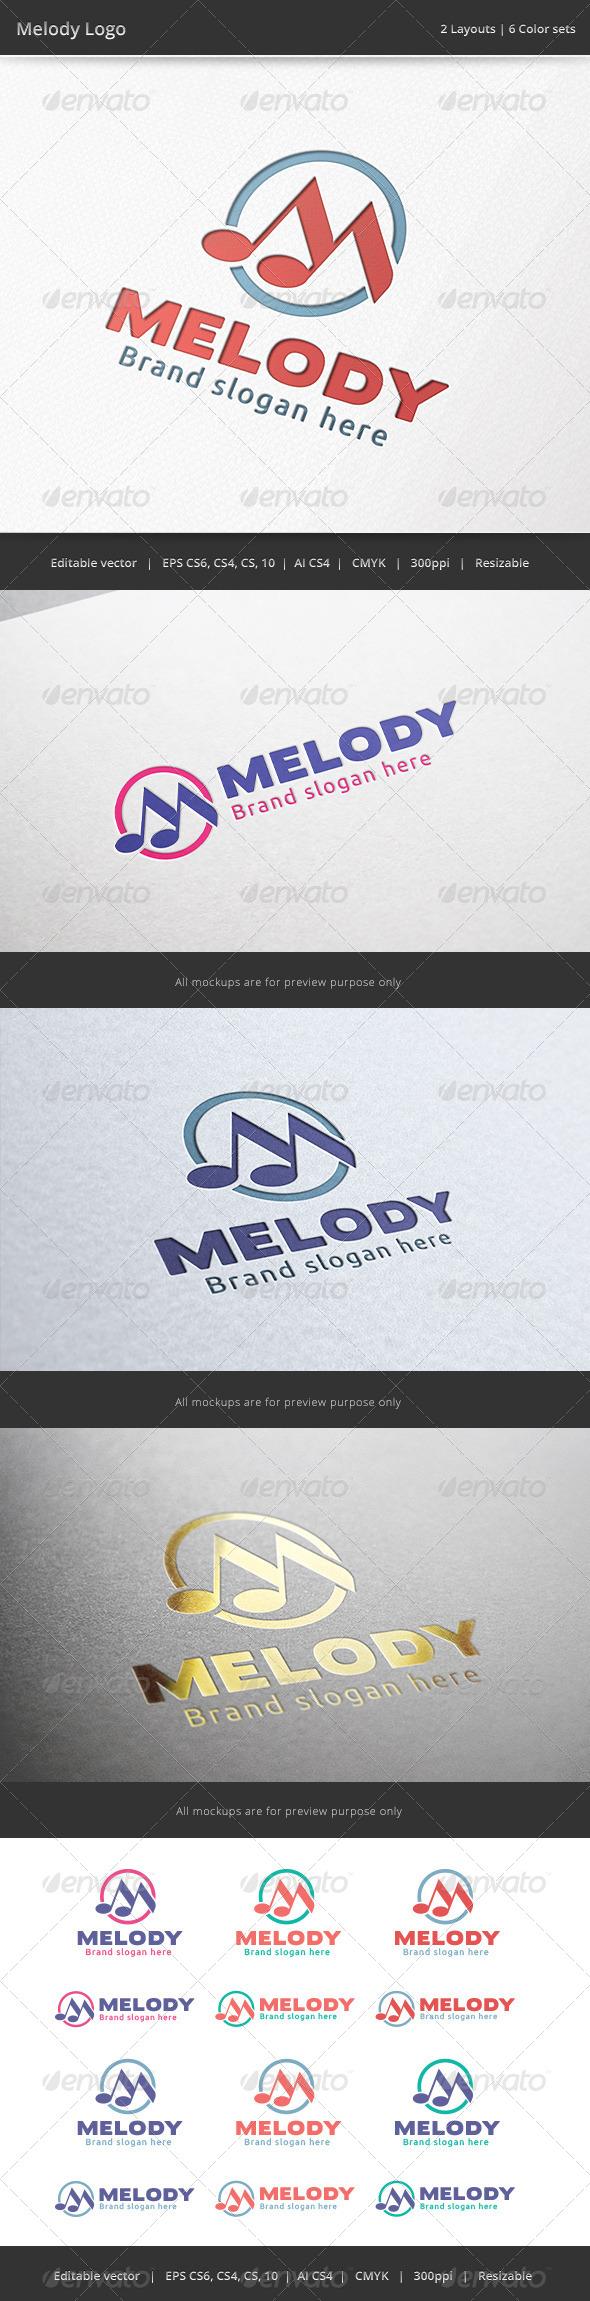 GraphicRiver Melody Music Logo 6958391